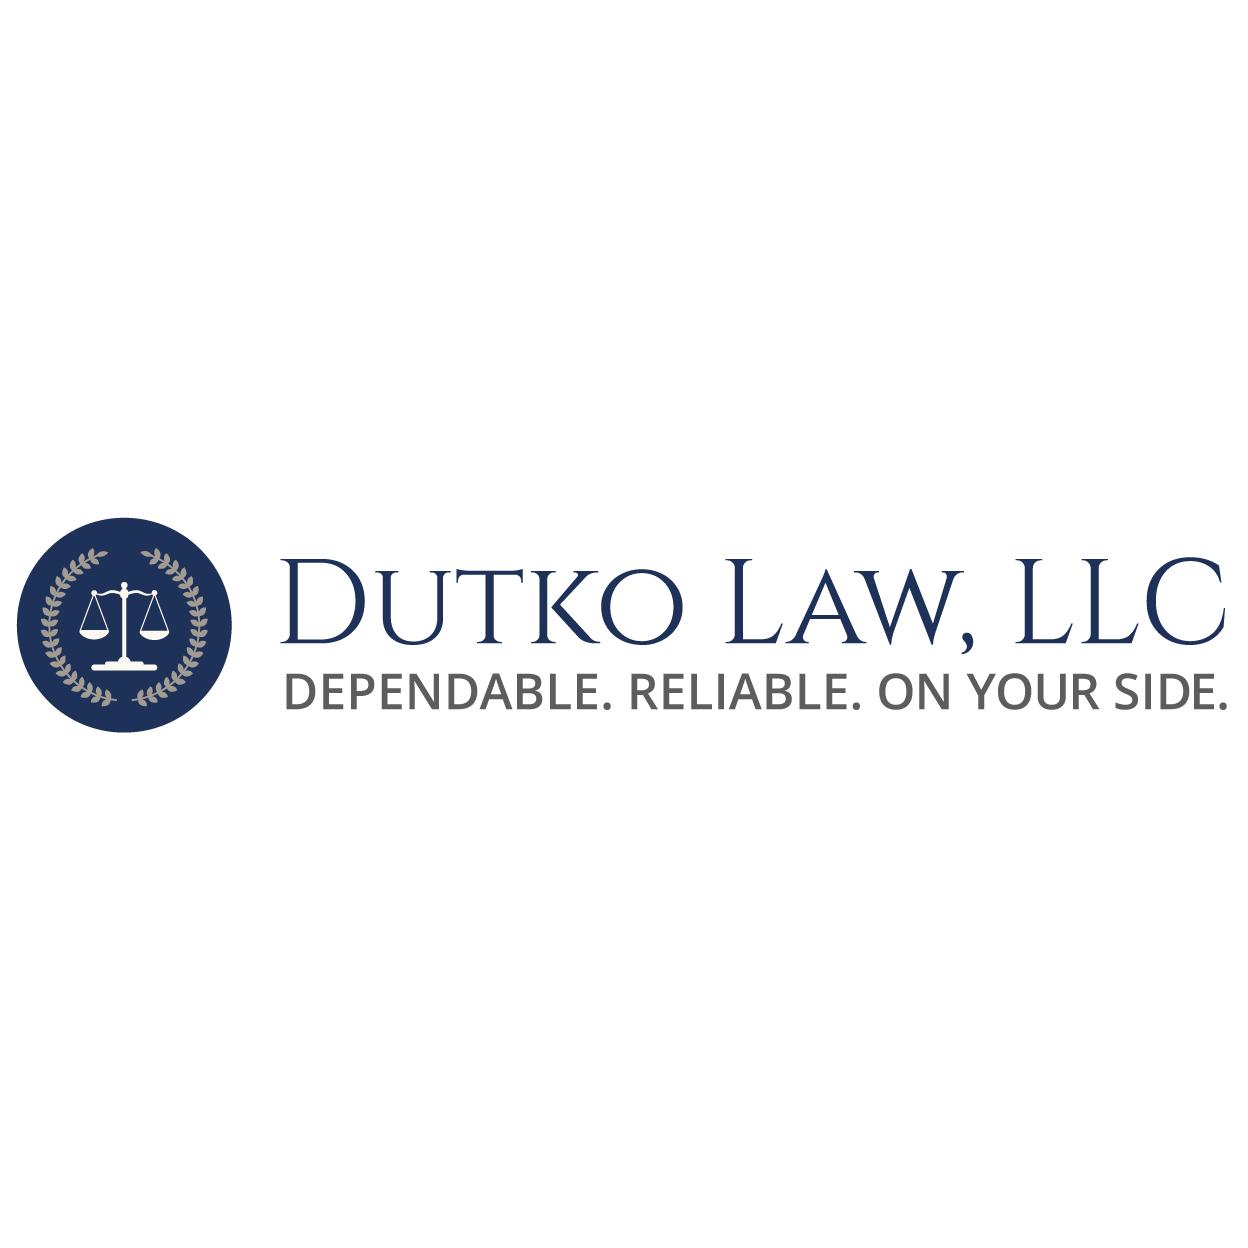 Dutko Law, LLC